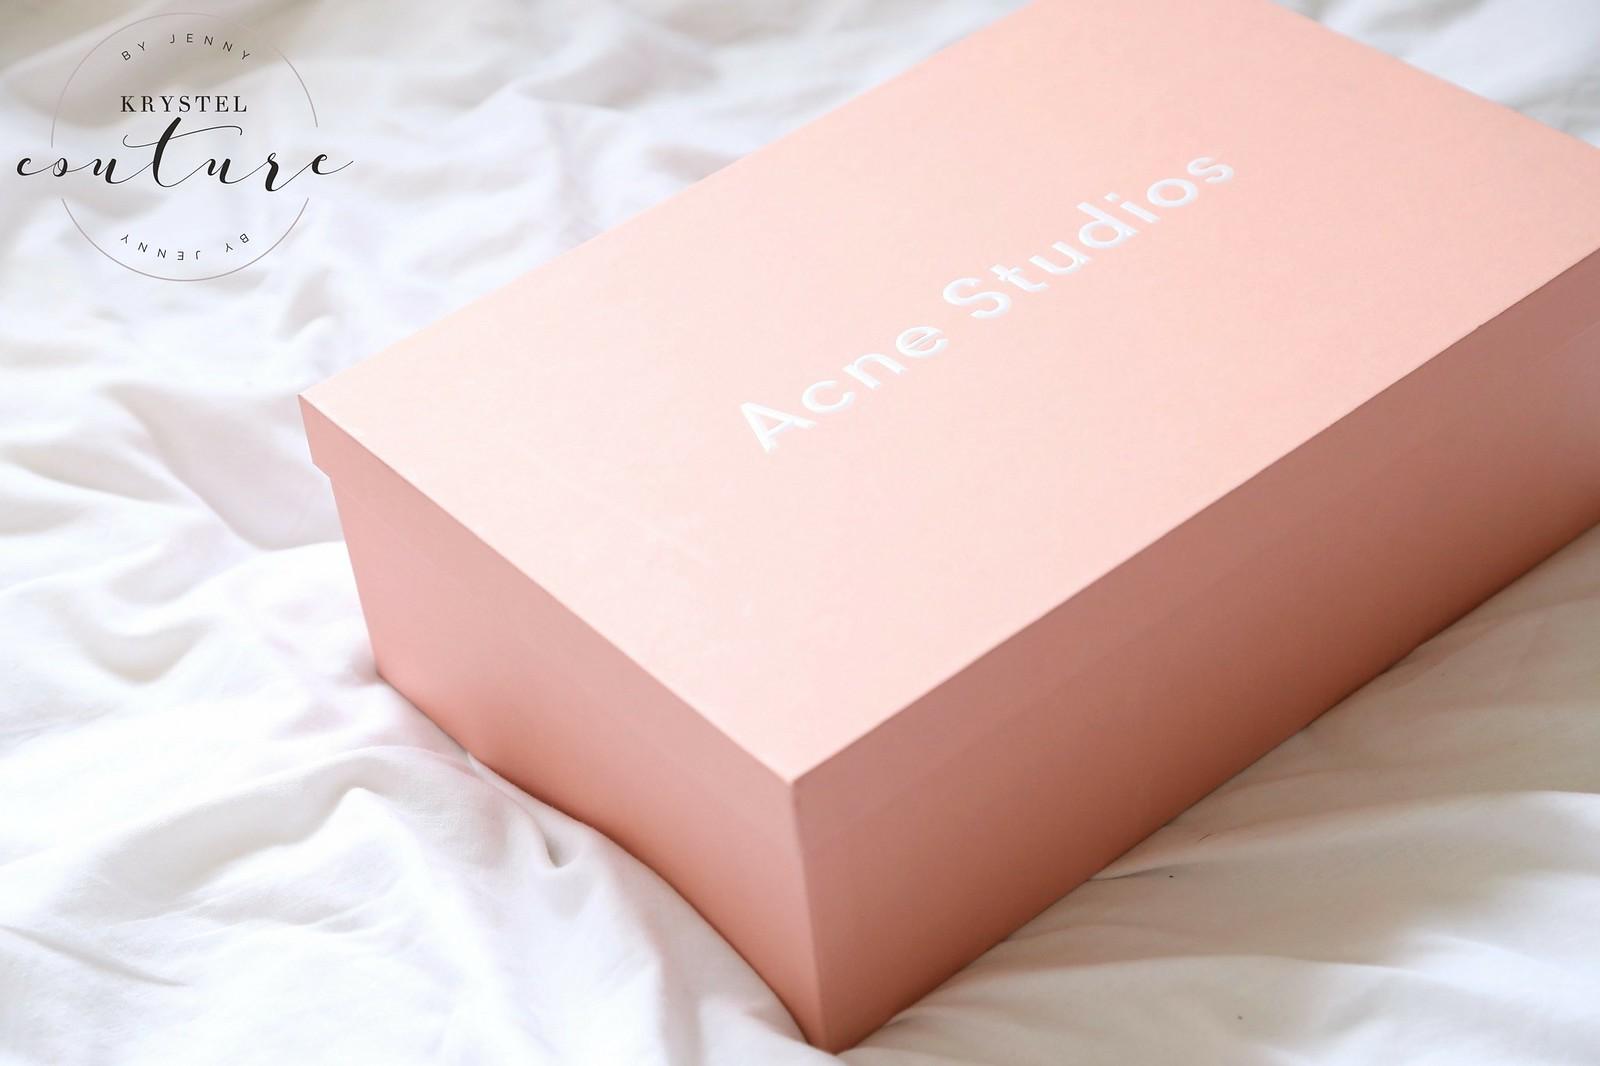 acnestudiospackaging, acnestudiosbox, acnestudios,